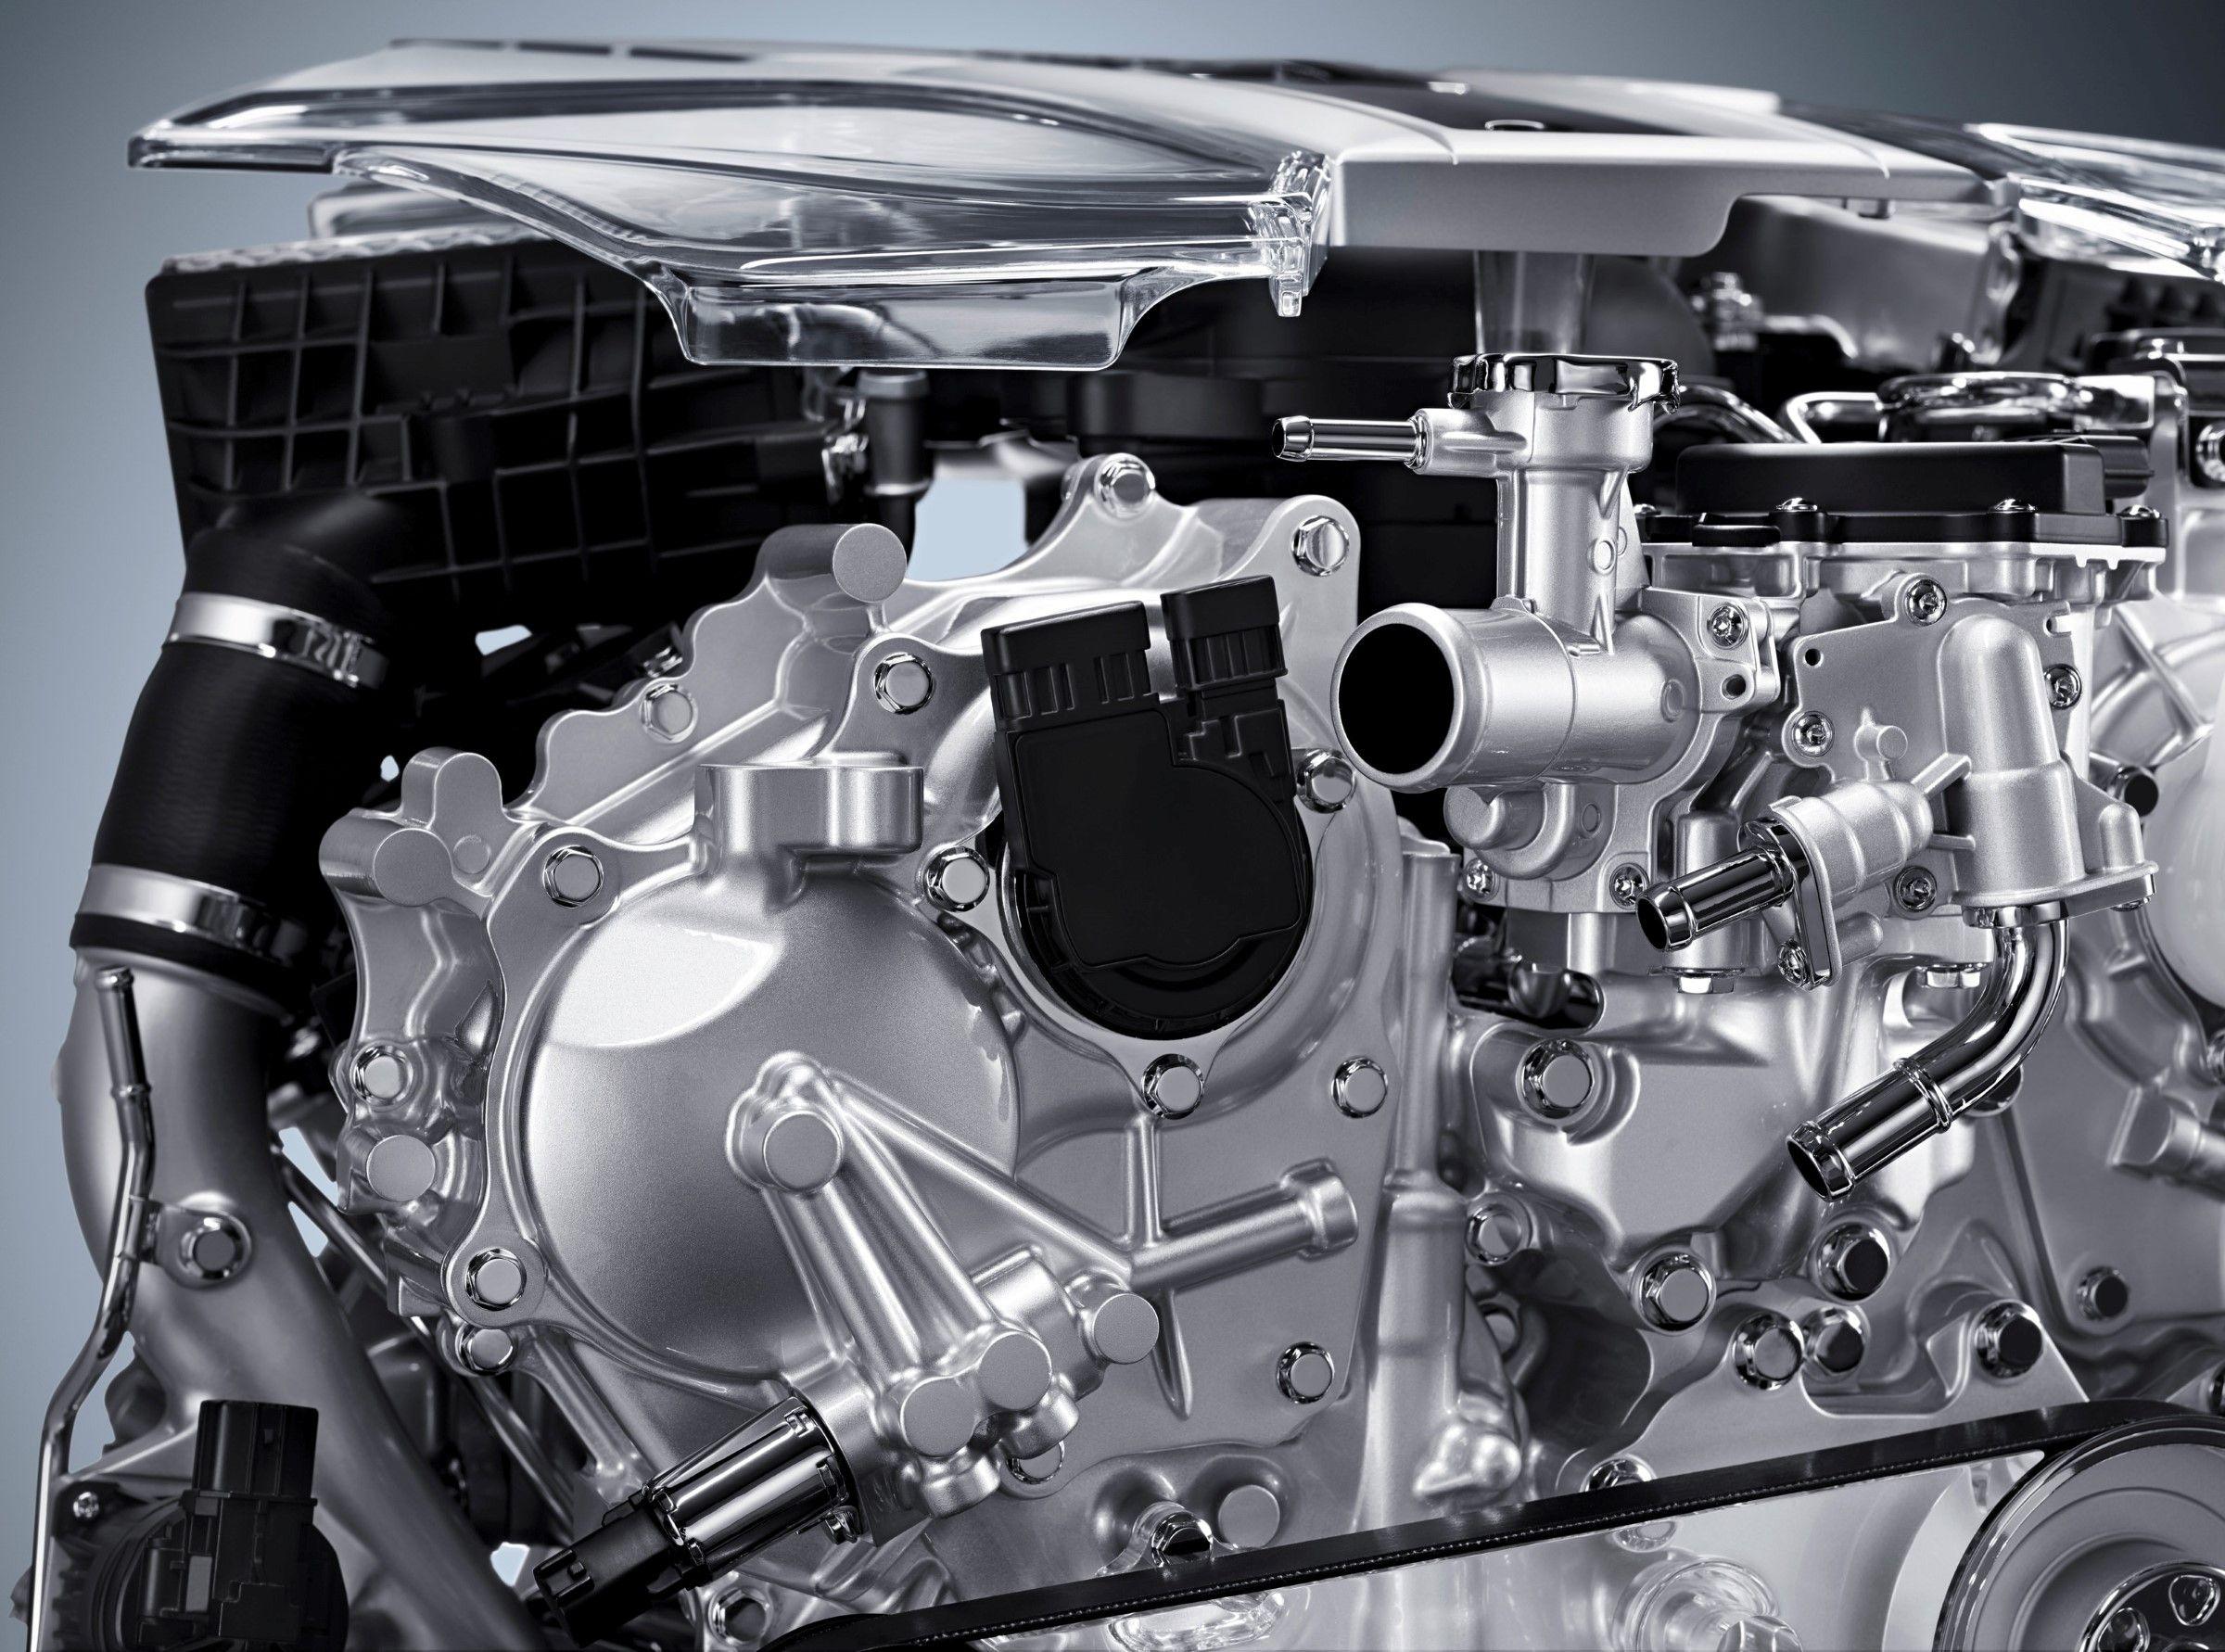 2017 Infiniti VR30DDTT 3 0-liter V6 twin-turbo engine